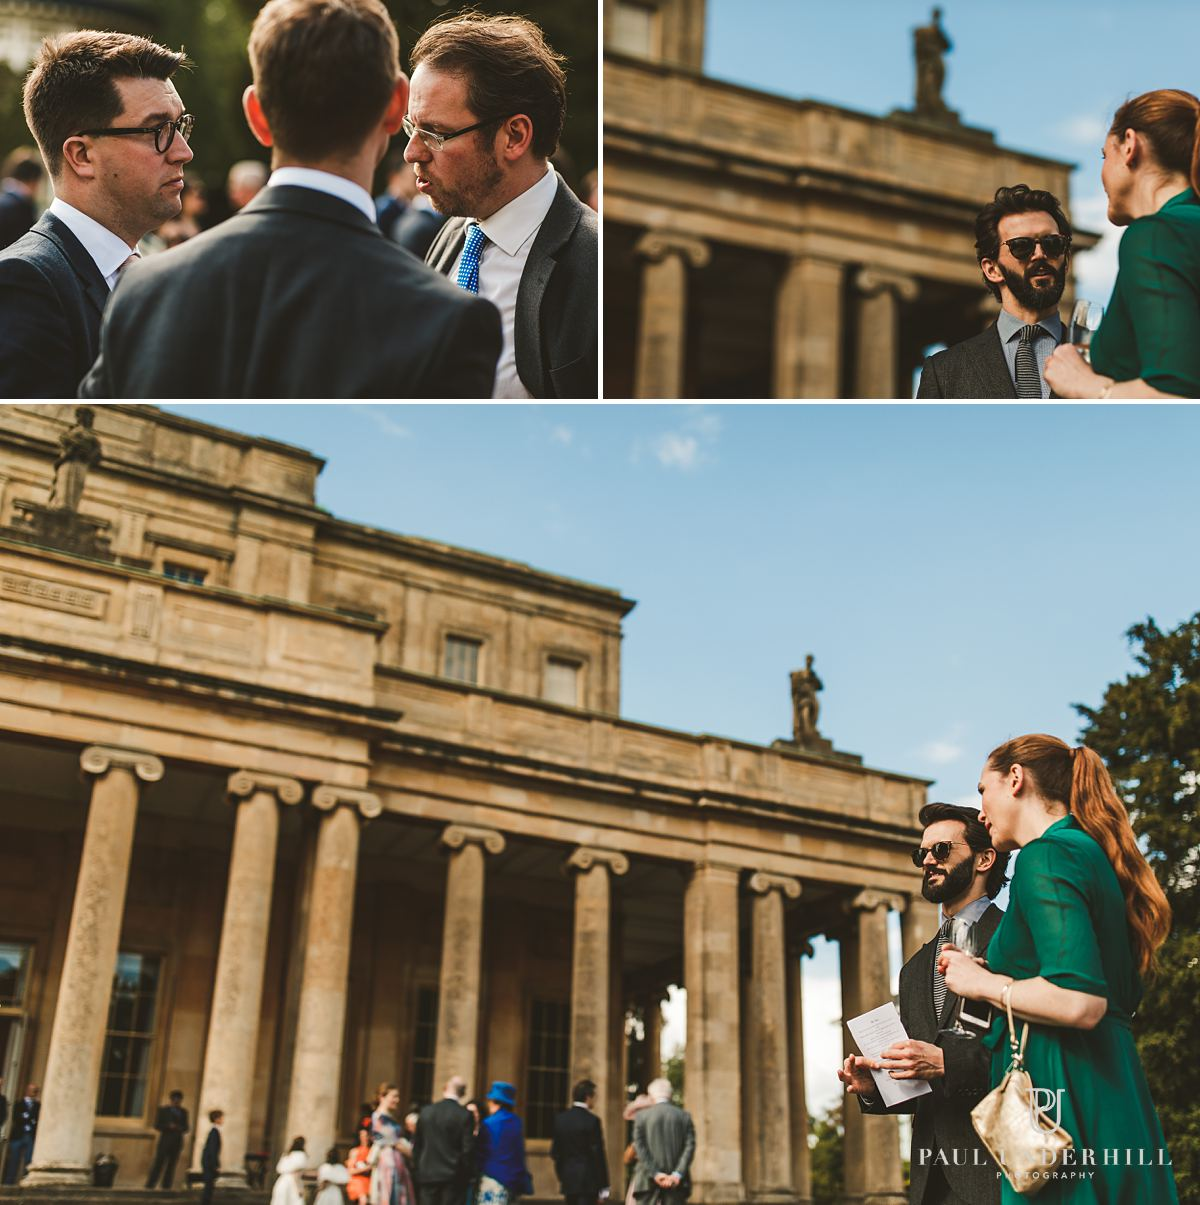 Documentary photography gay weddings